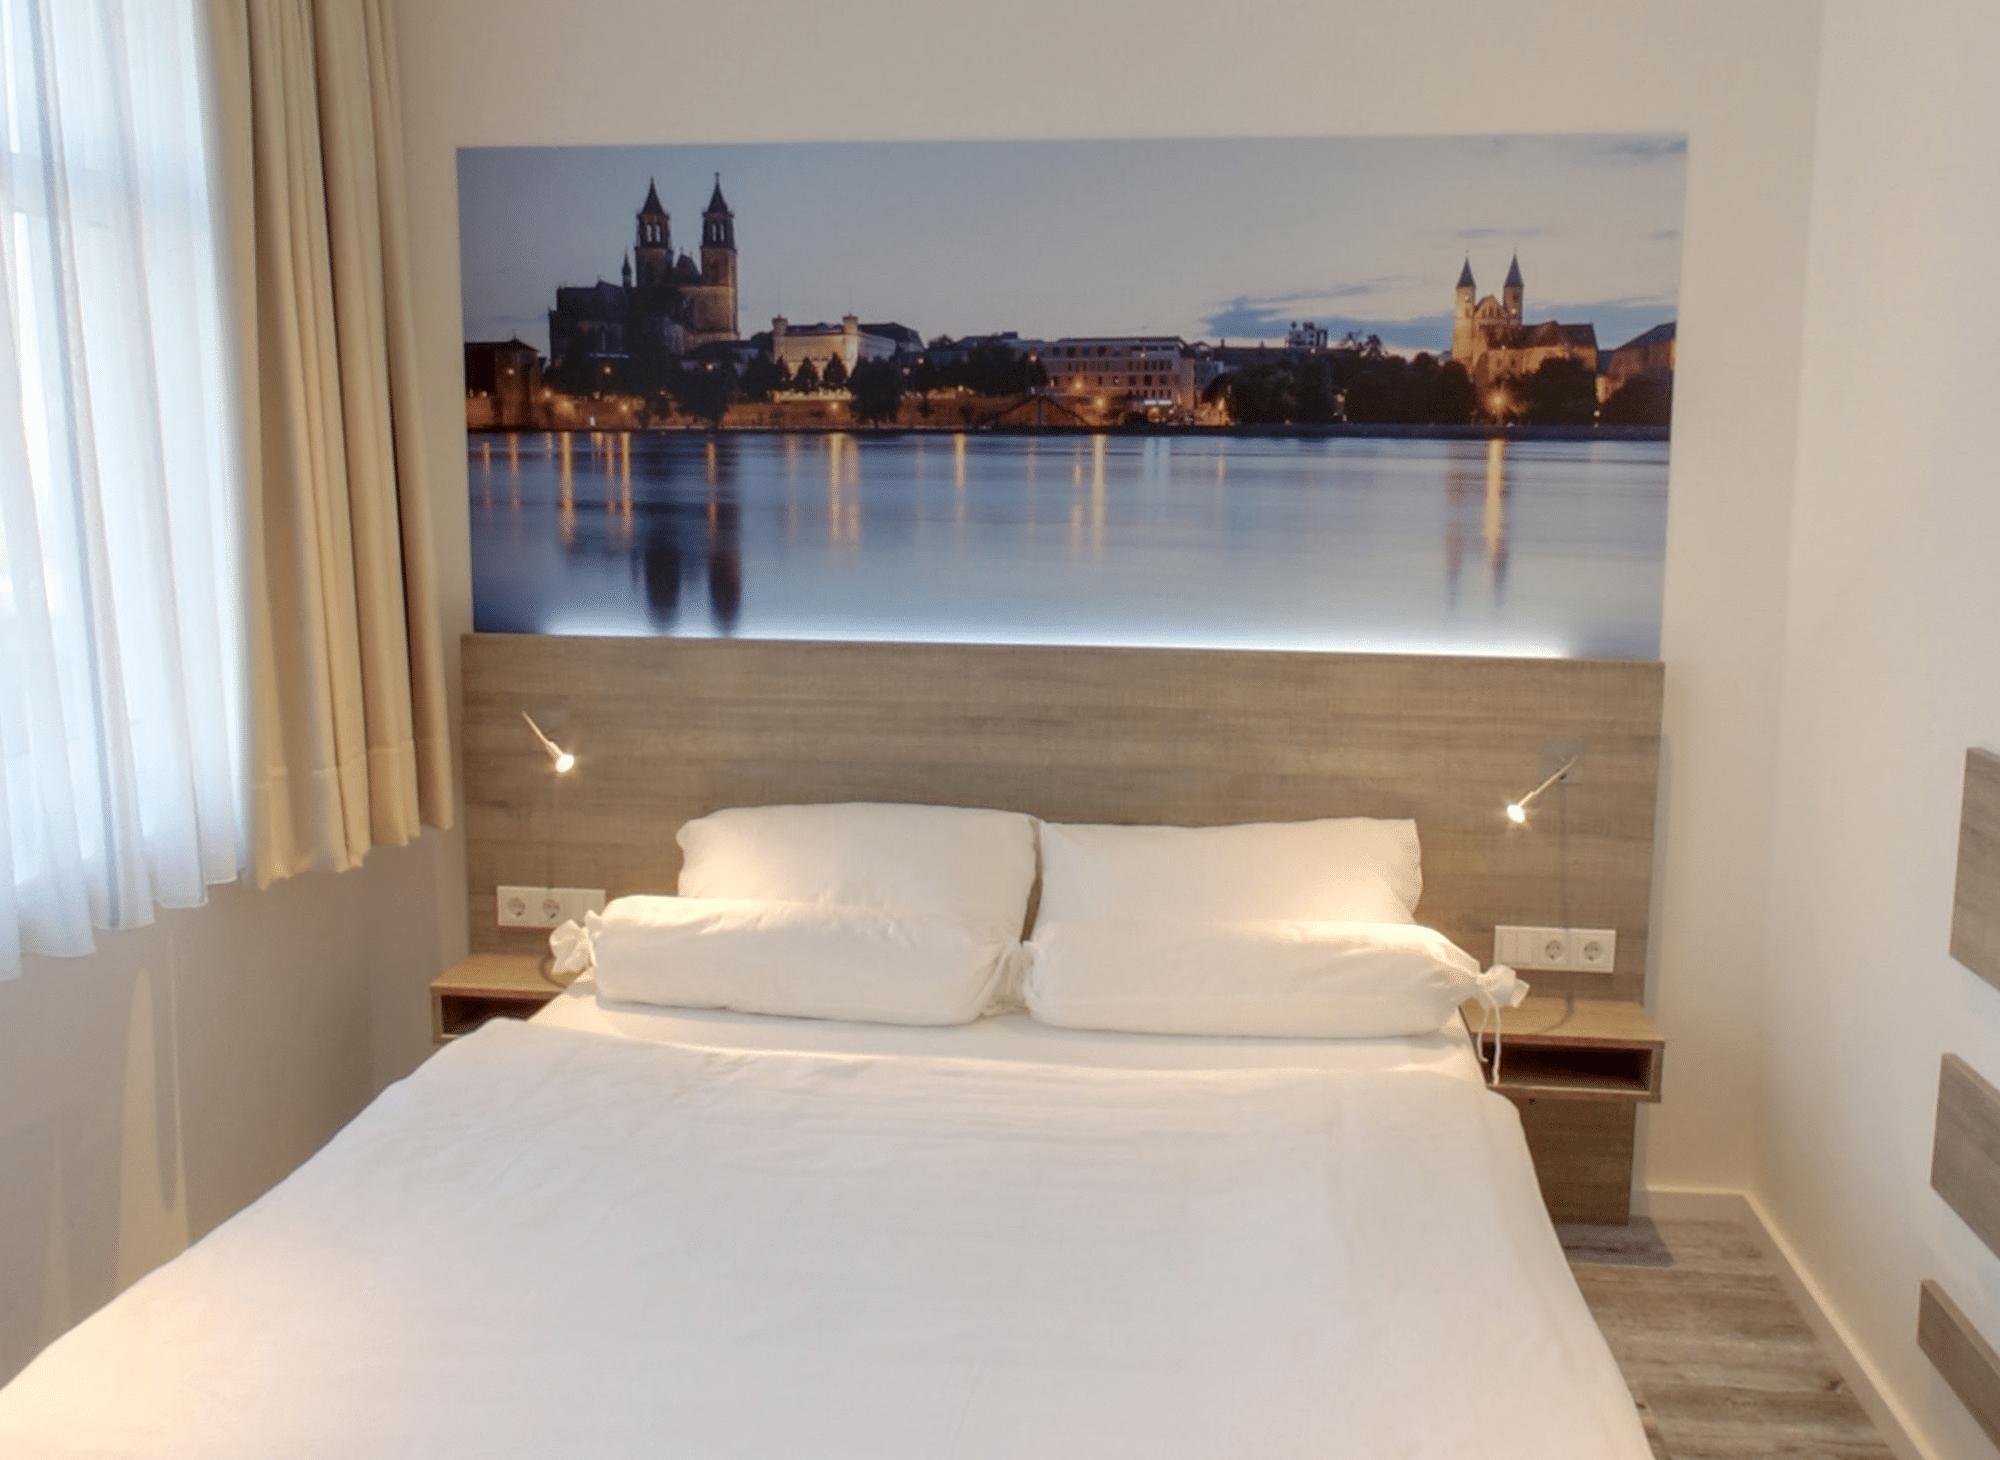 ratswaage hotel magdeburg patrick roddelkopf fotografie